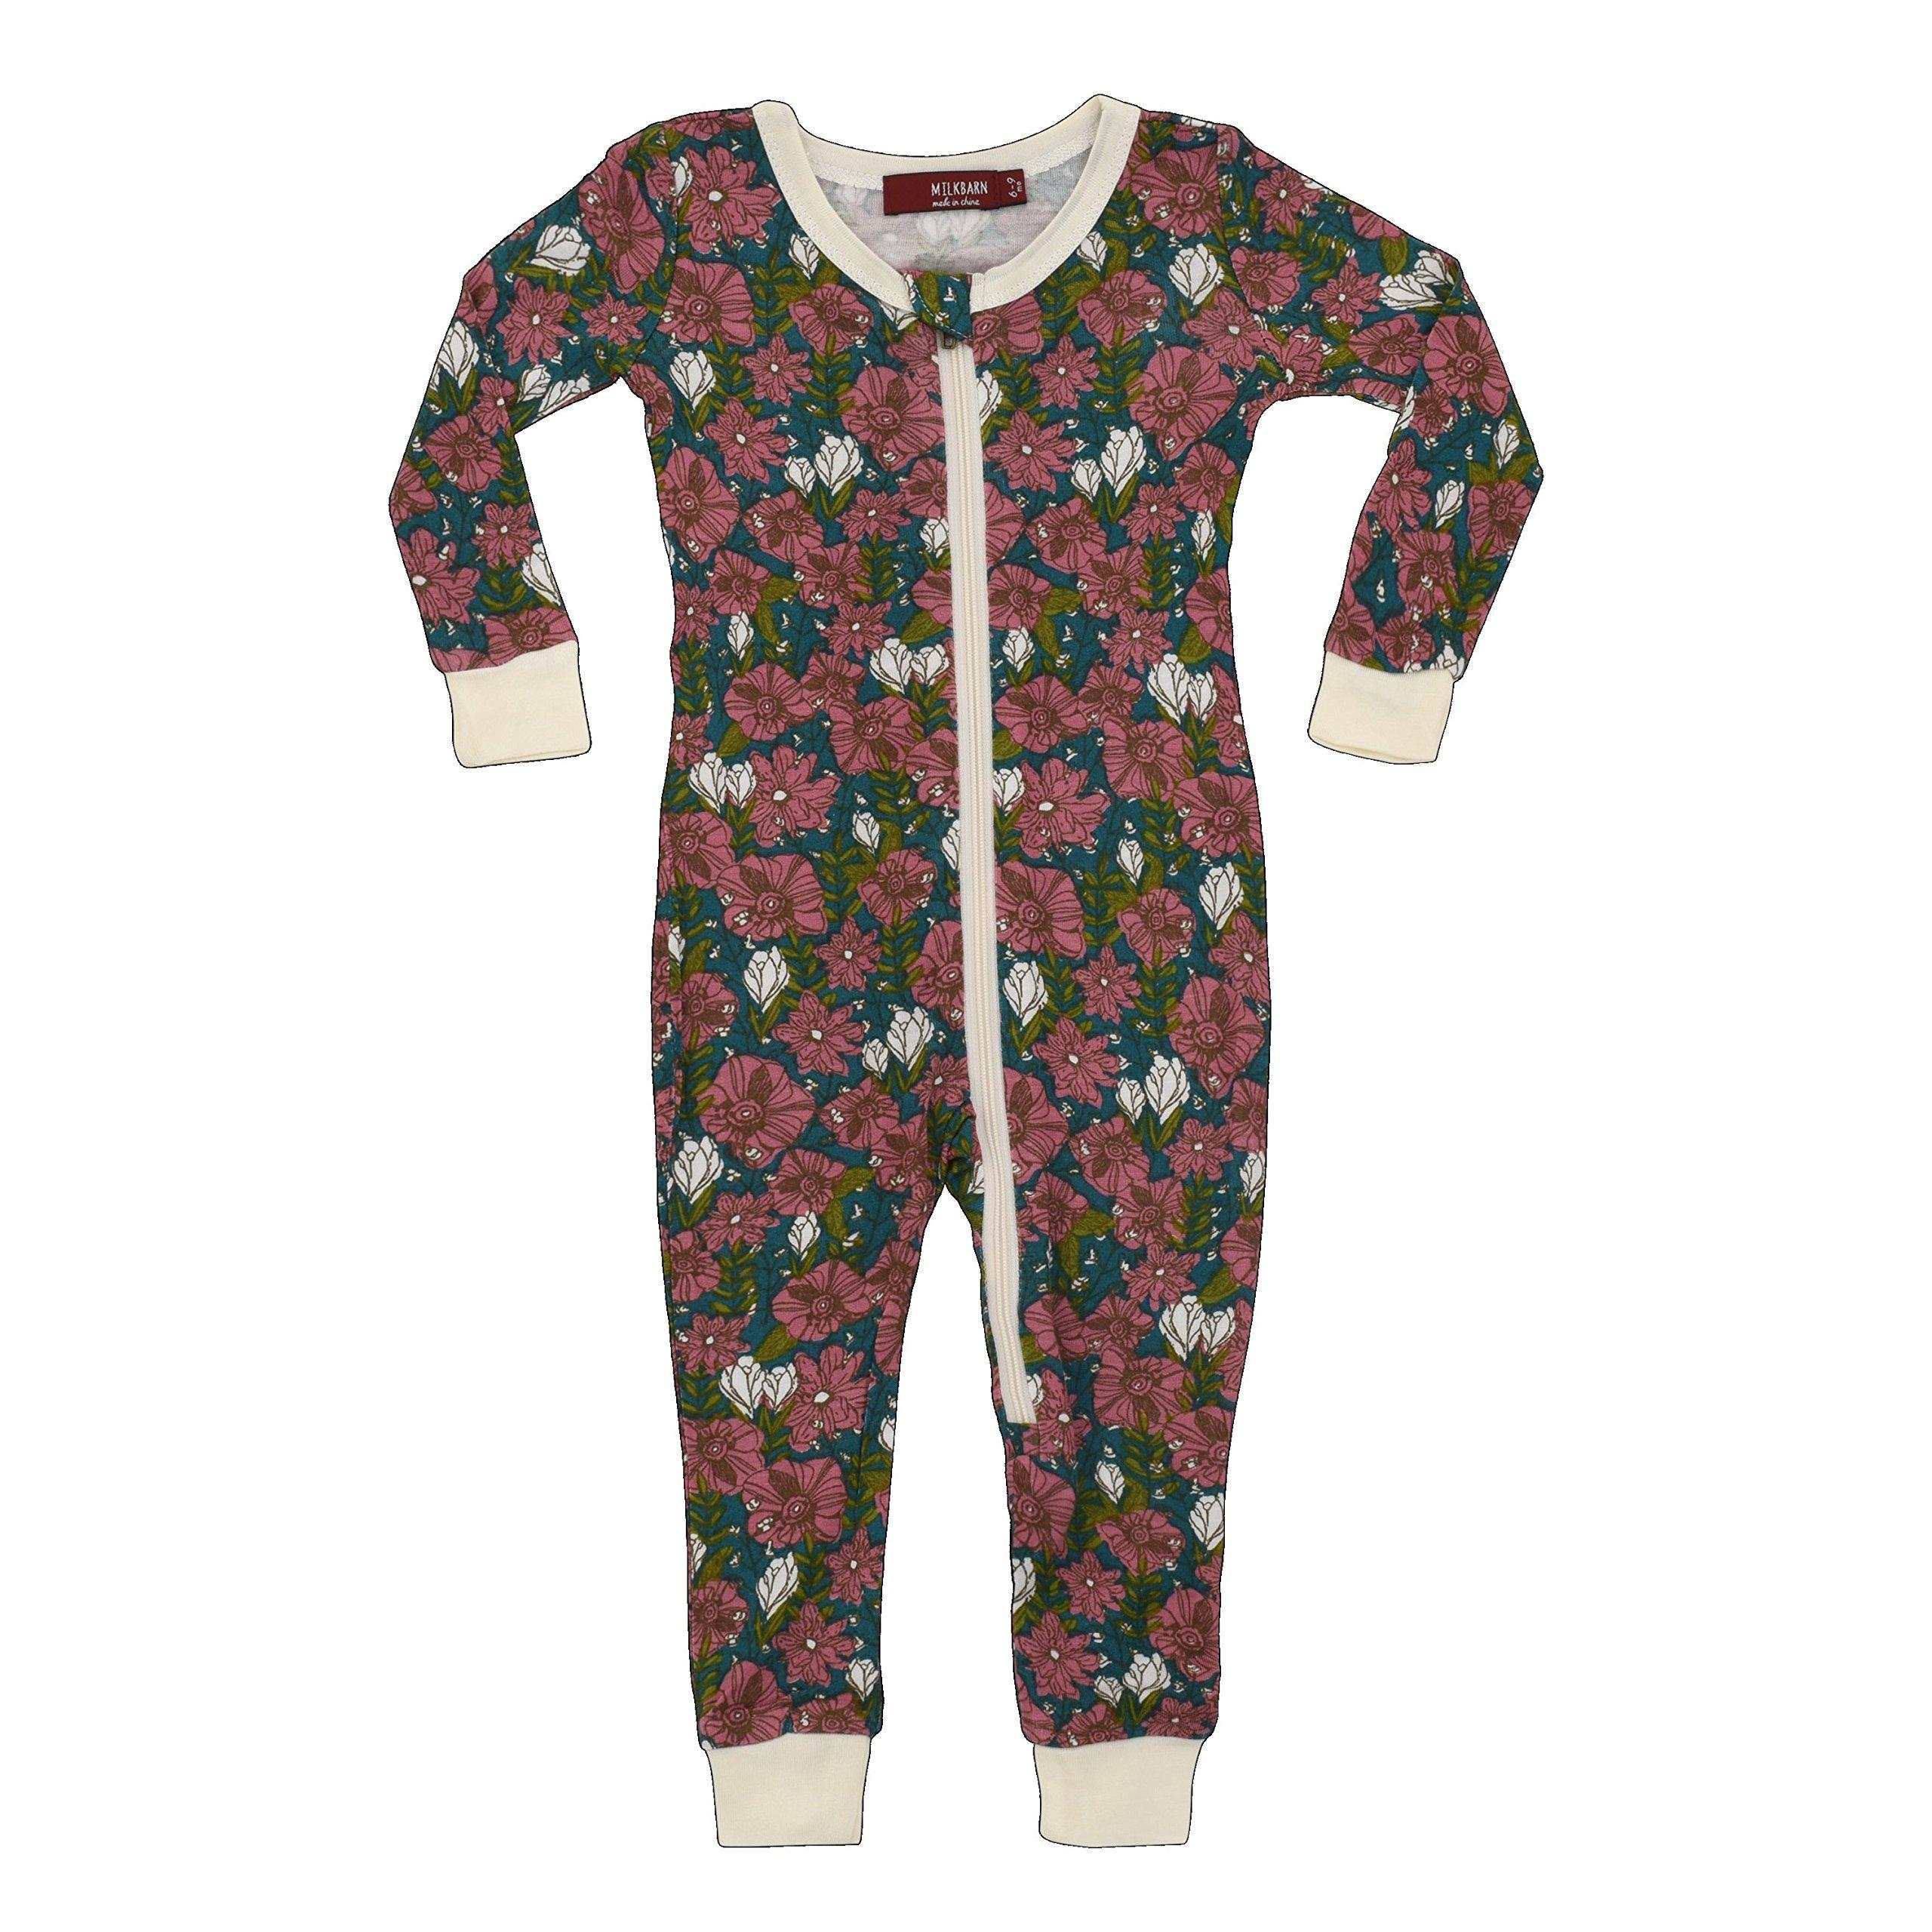 MilkBarn Bamboo Zipper Pajama - Teal Floral (6-9 Months) by MilkBarn